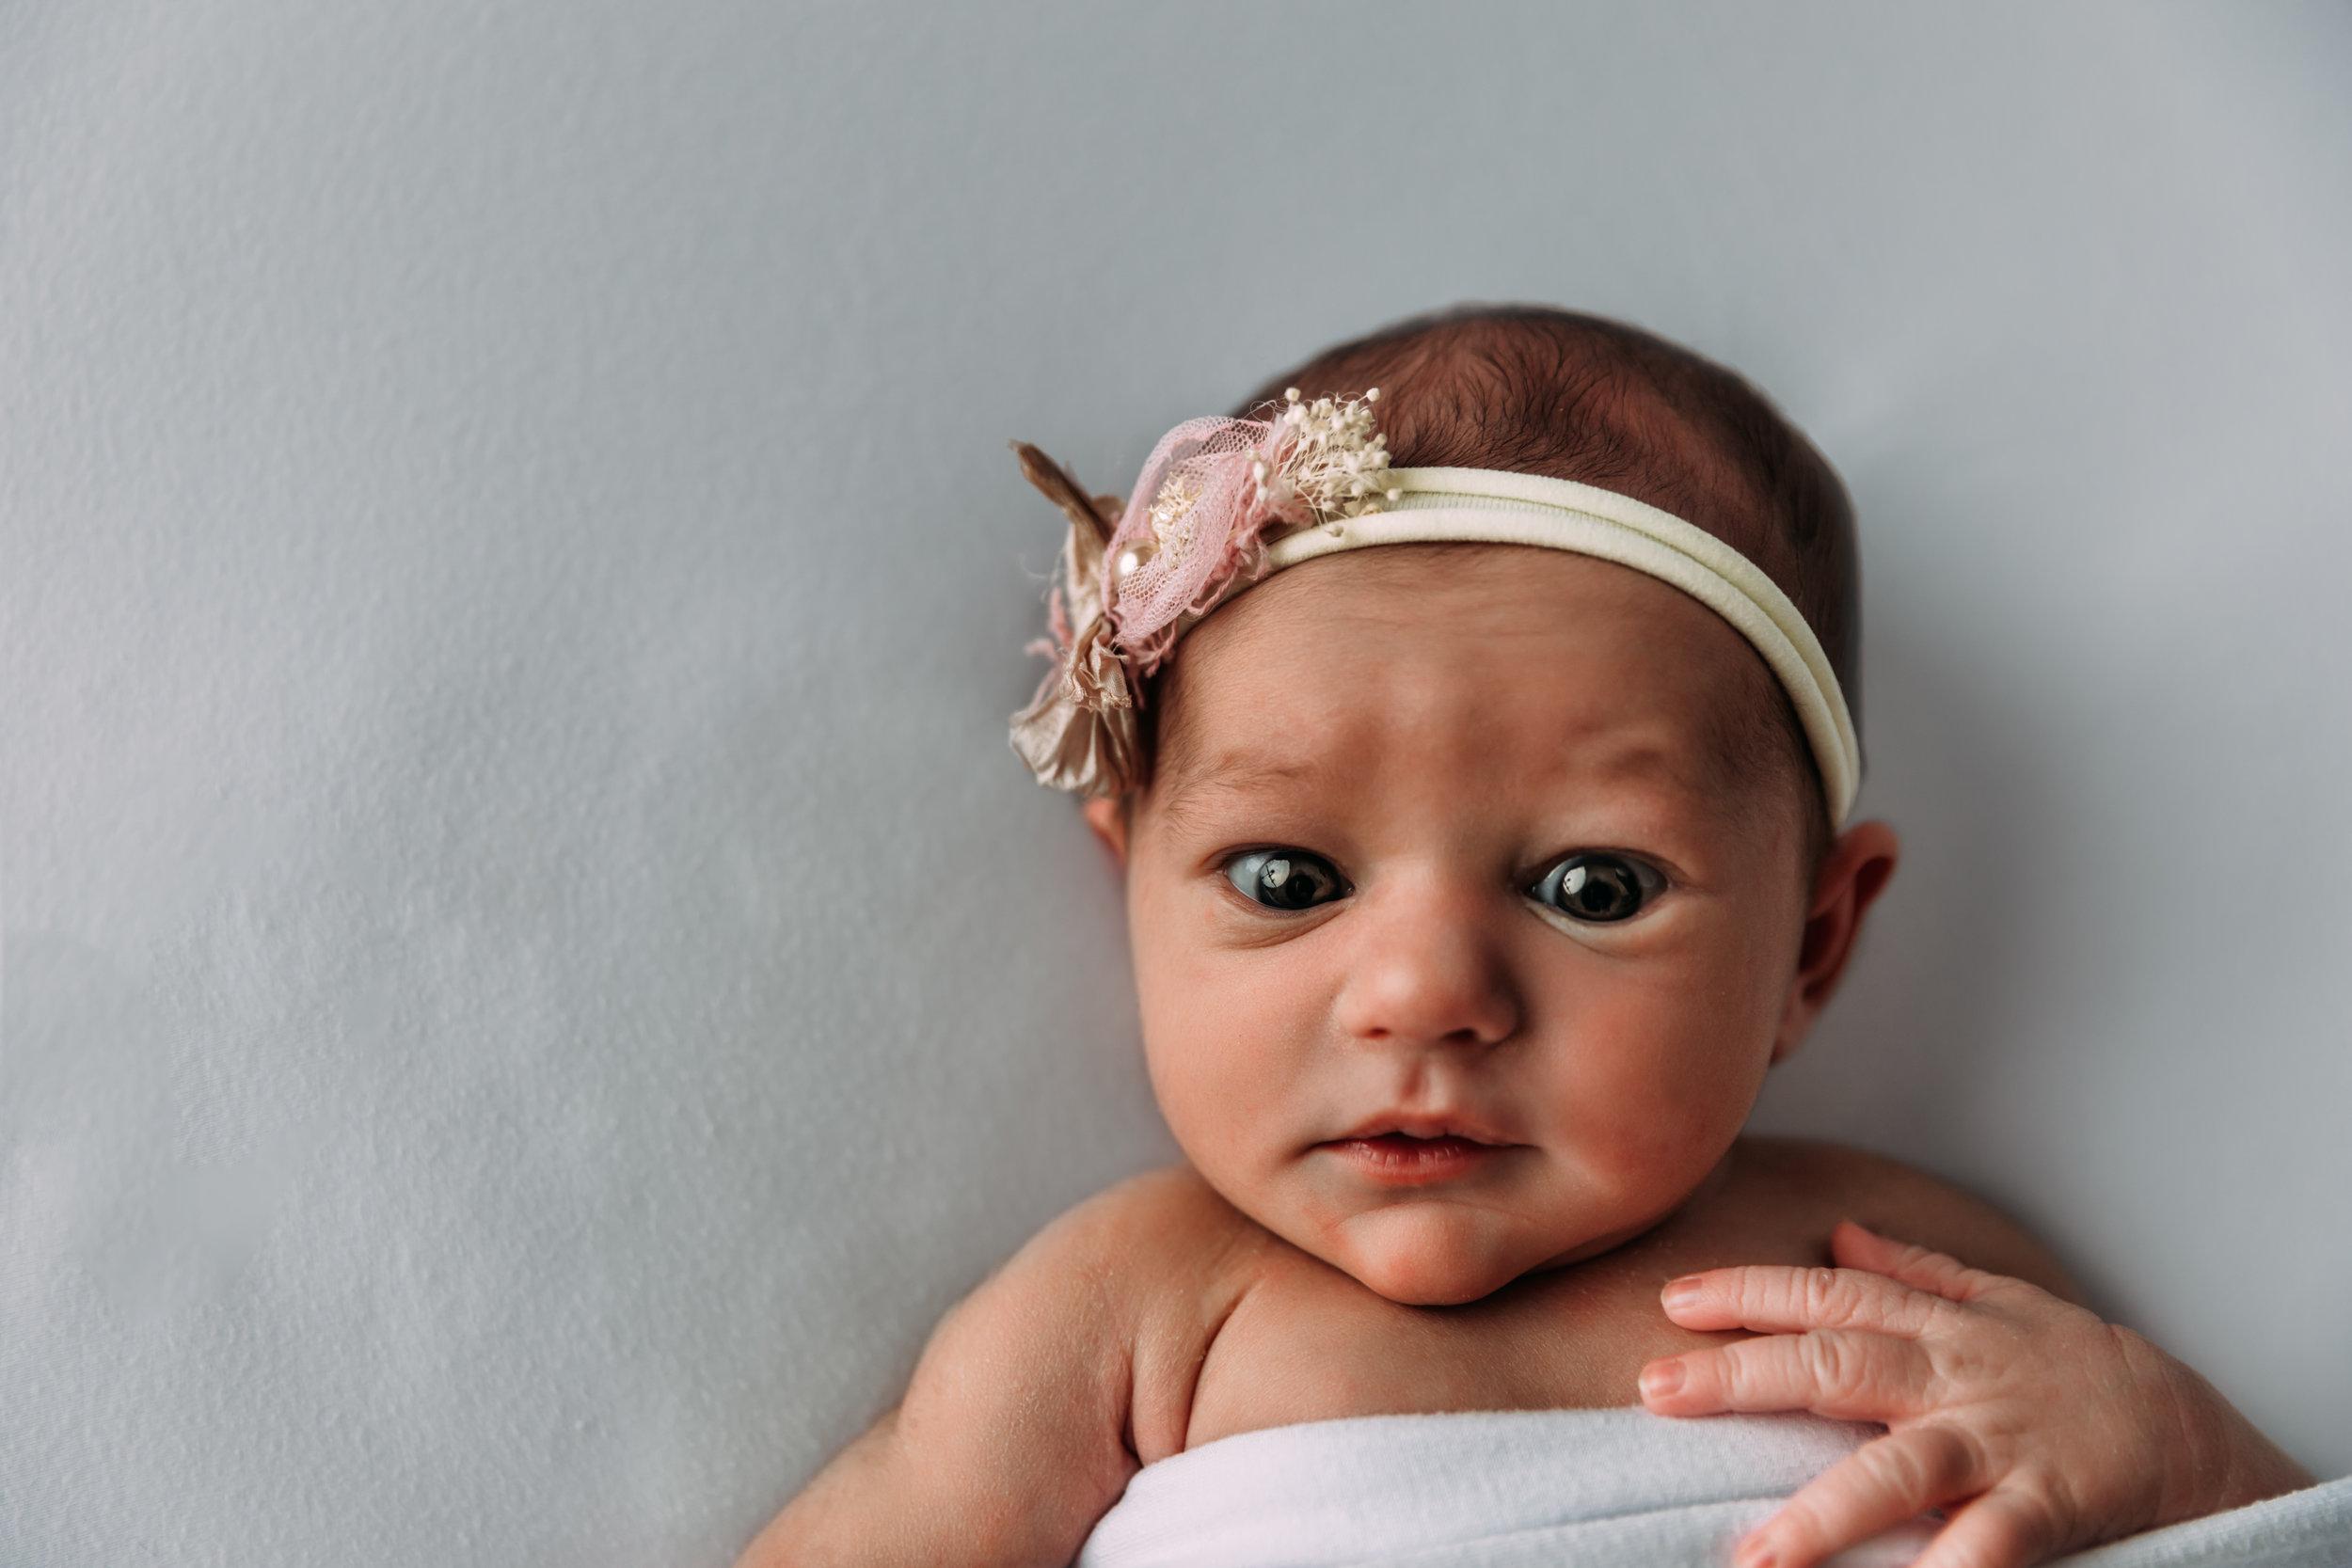 newborn-photography-austin-minnesota-studio-albert-lea-minnesota-all-white-modern